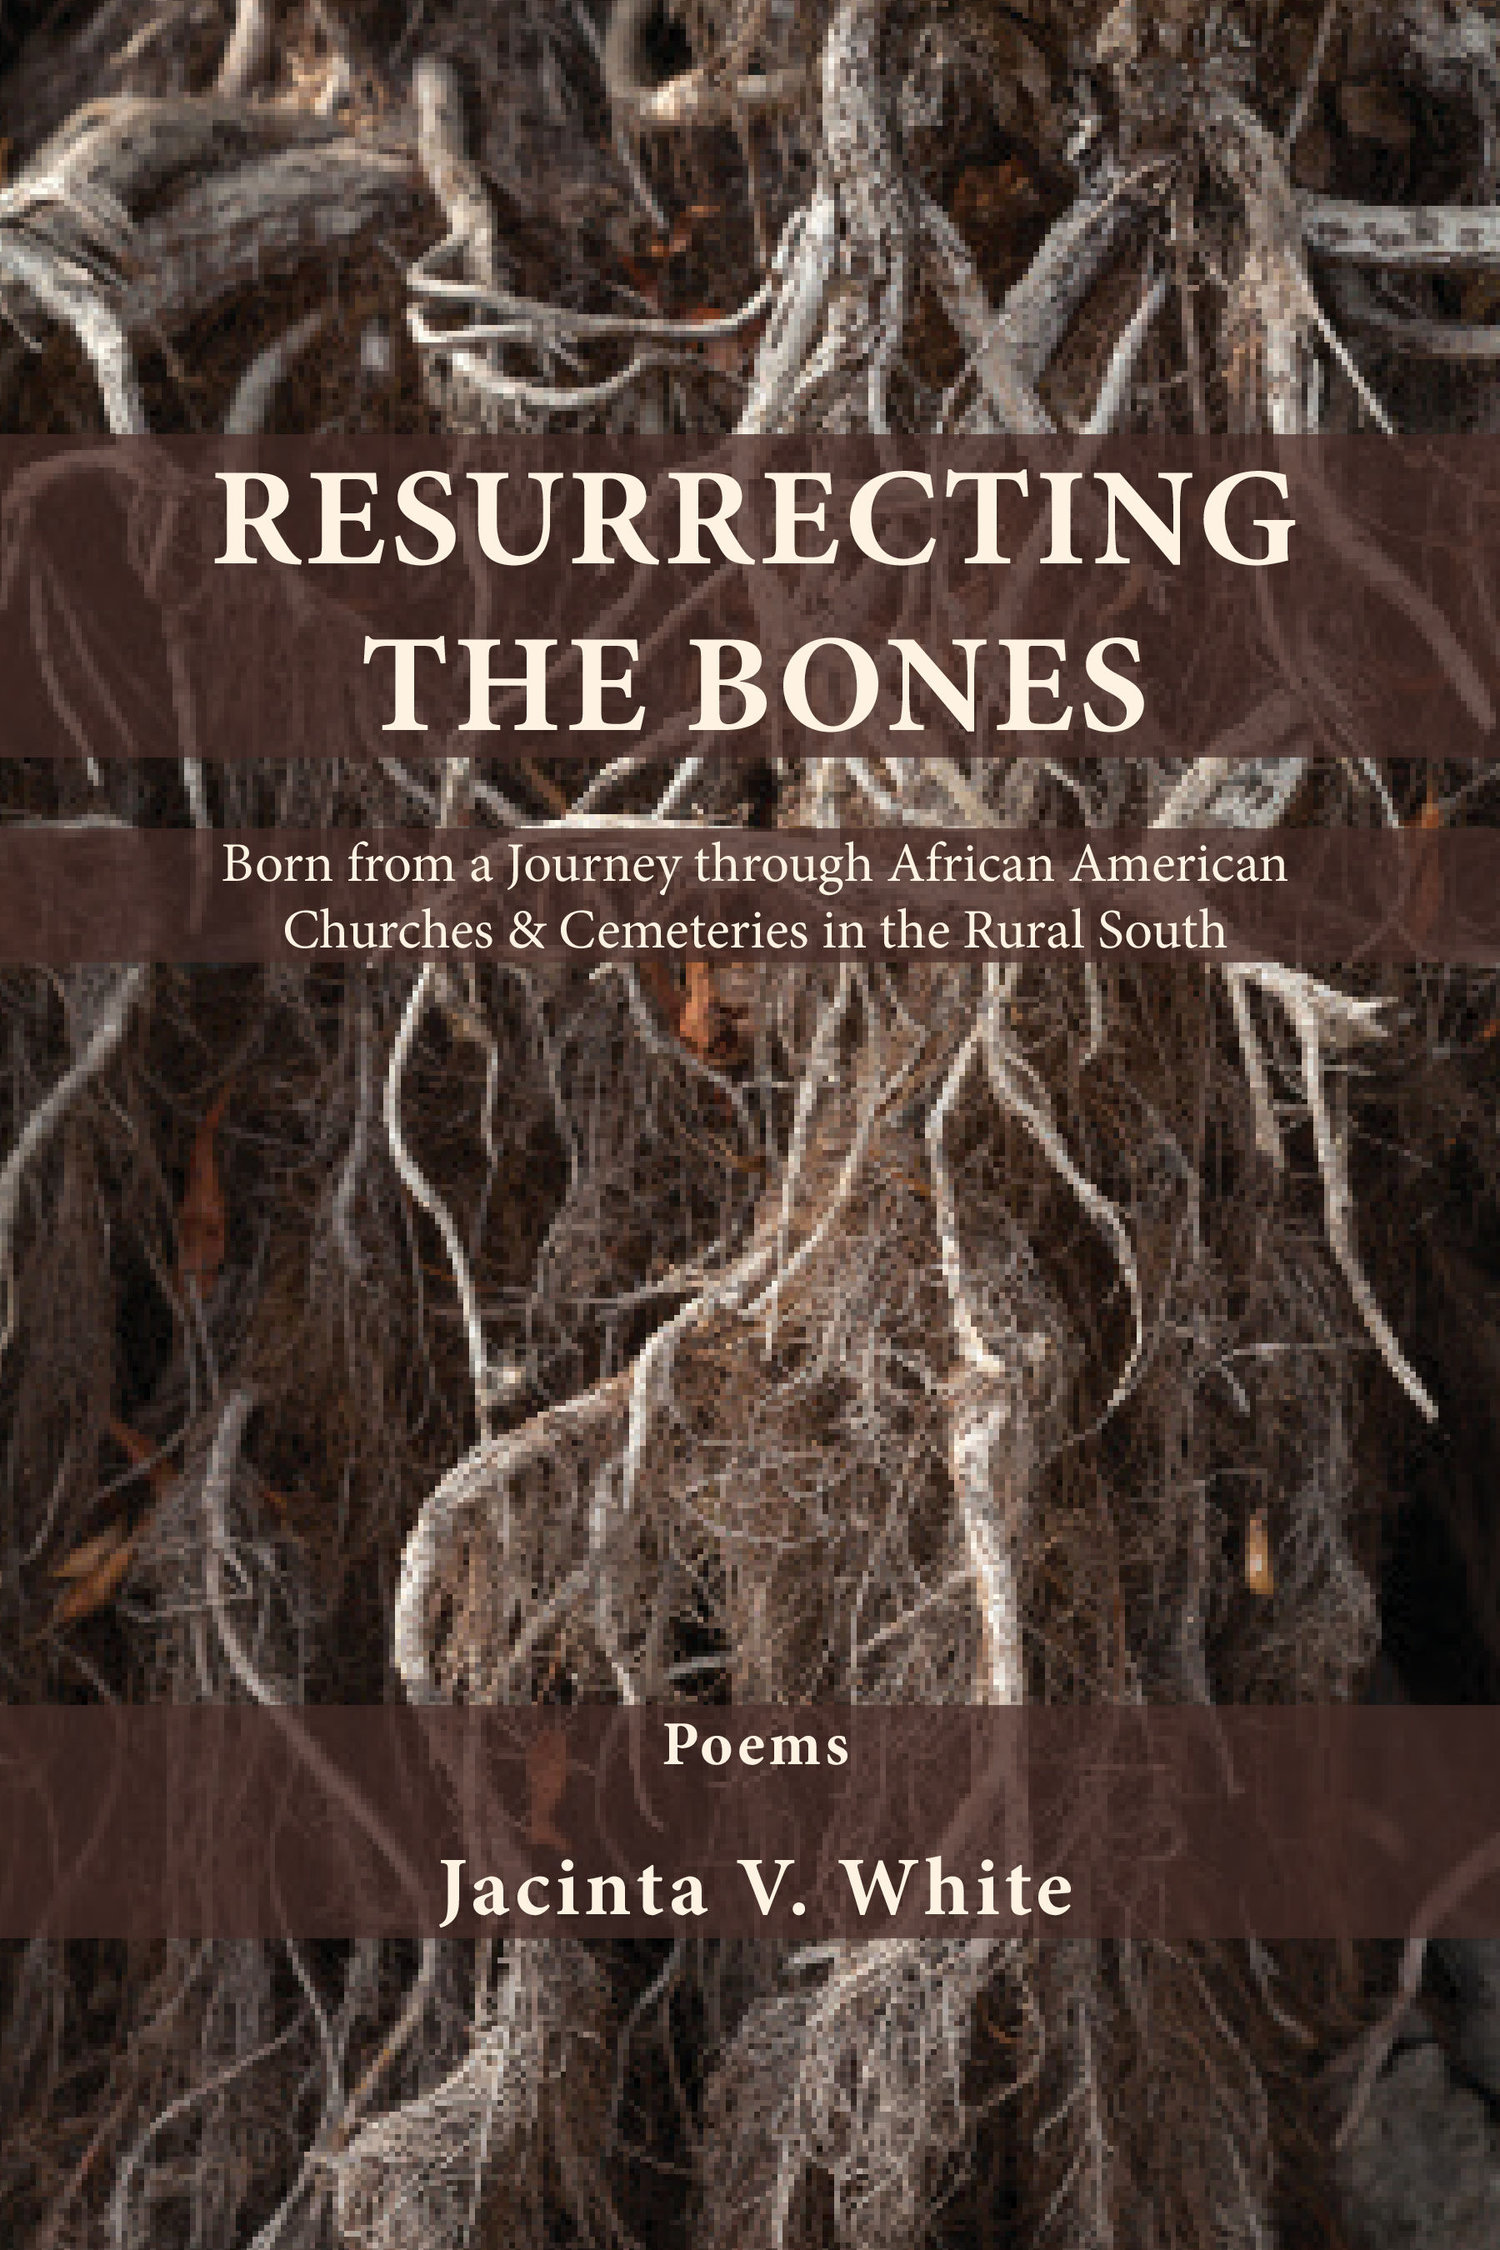 Jacinda White Poetry Launch